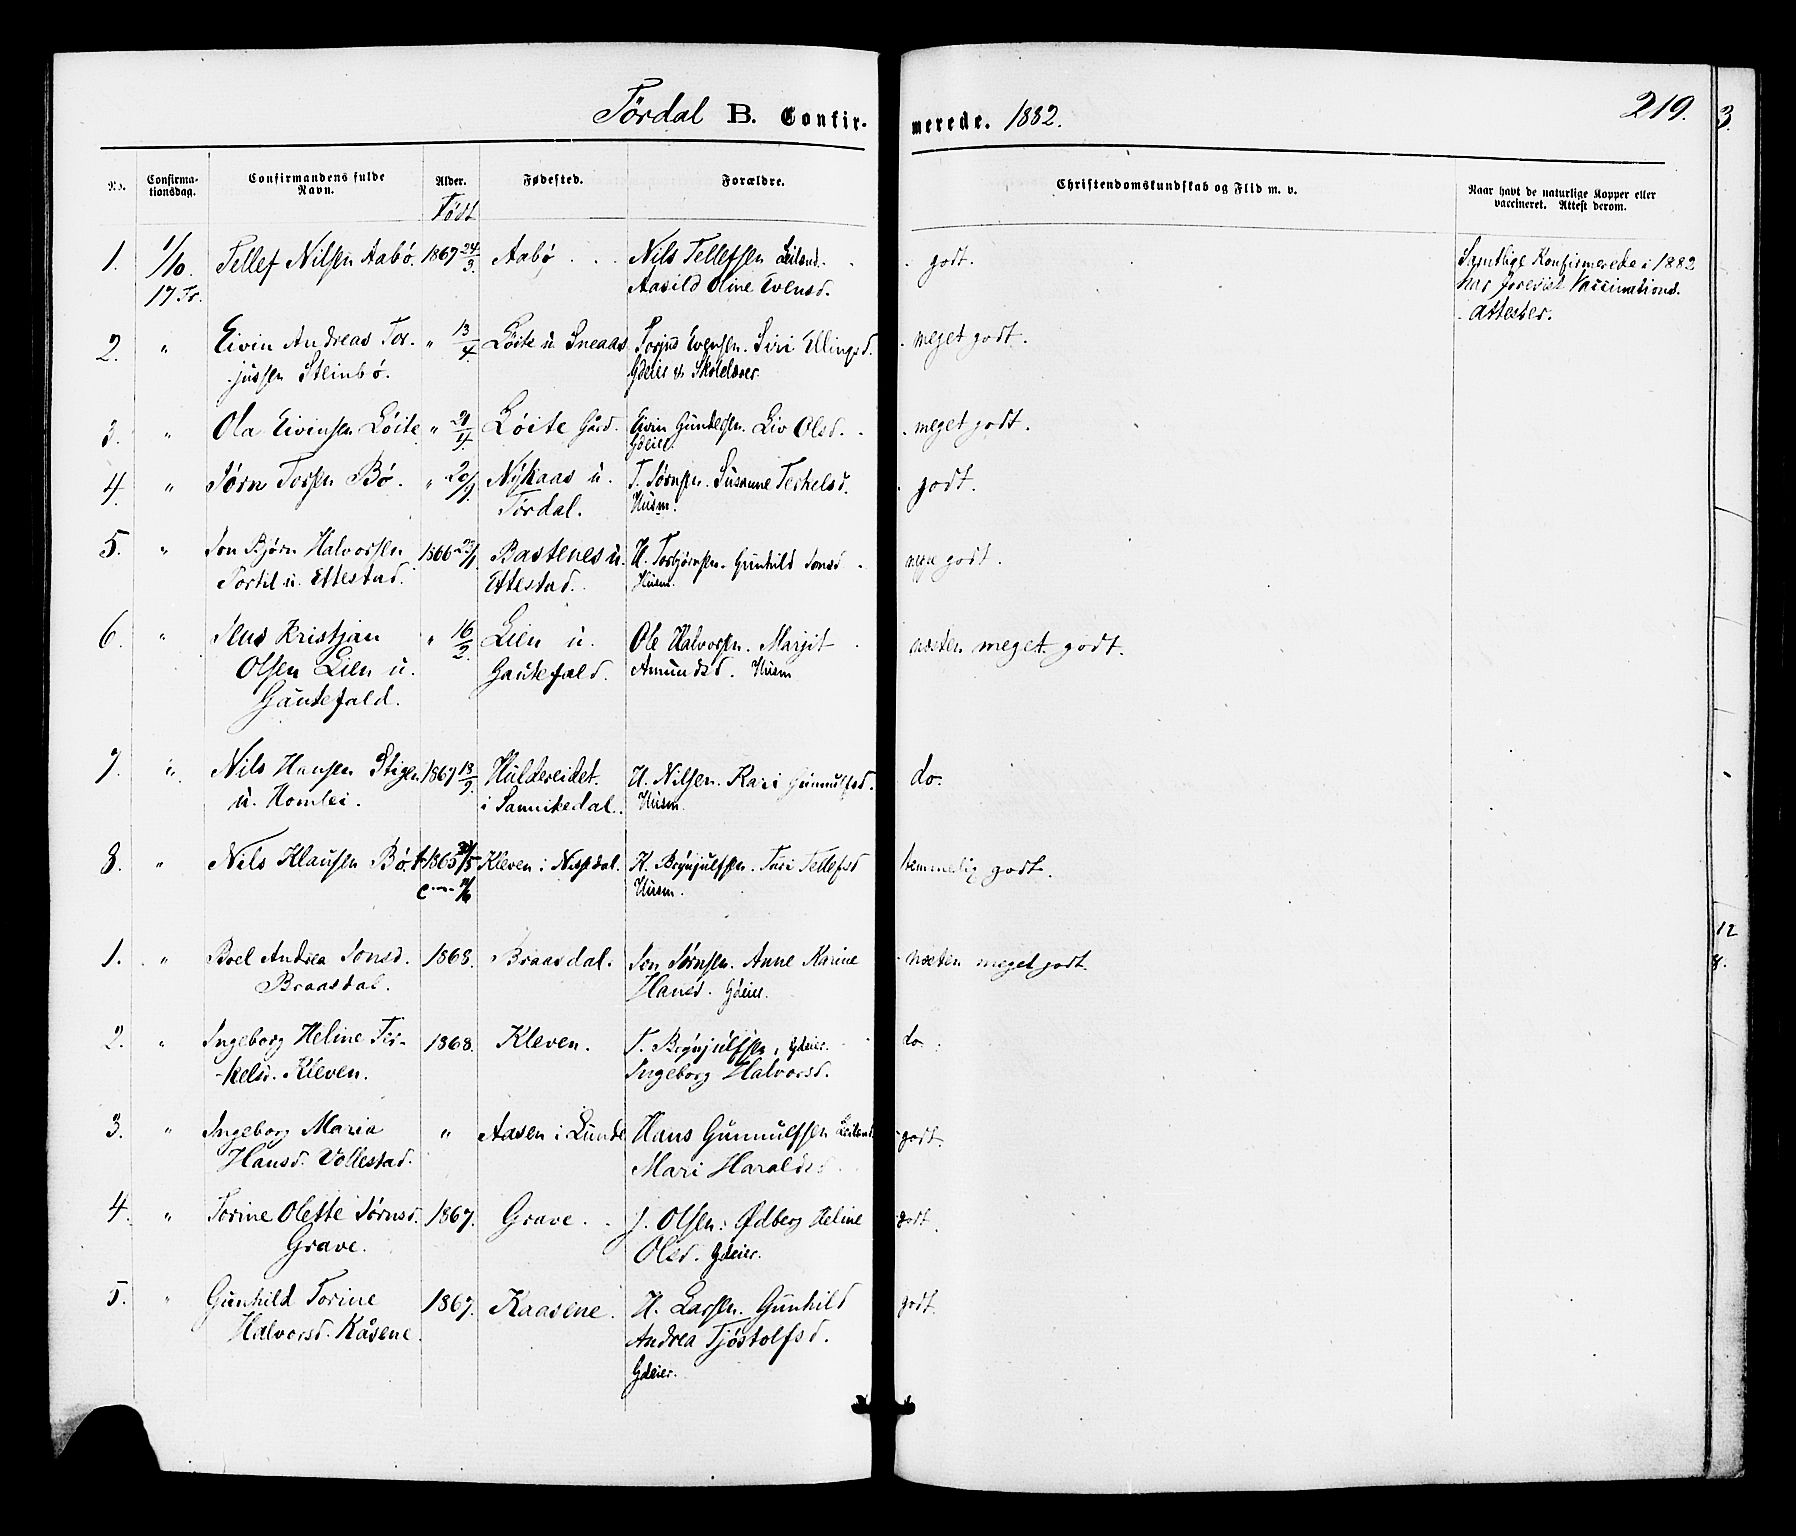 SAKO, Drangedal kirkebøker, F/Fa/L0009: Ministerialbok nr. 9 /2, 1872-1884, s. 219